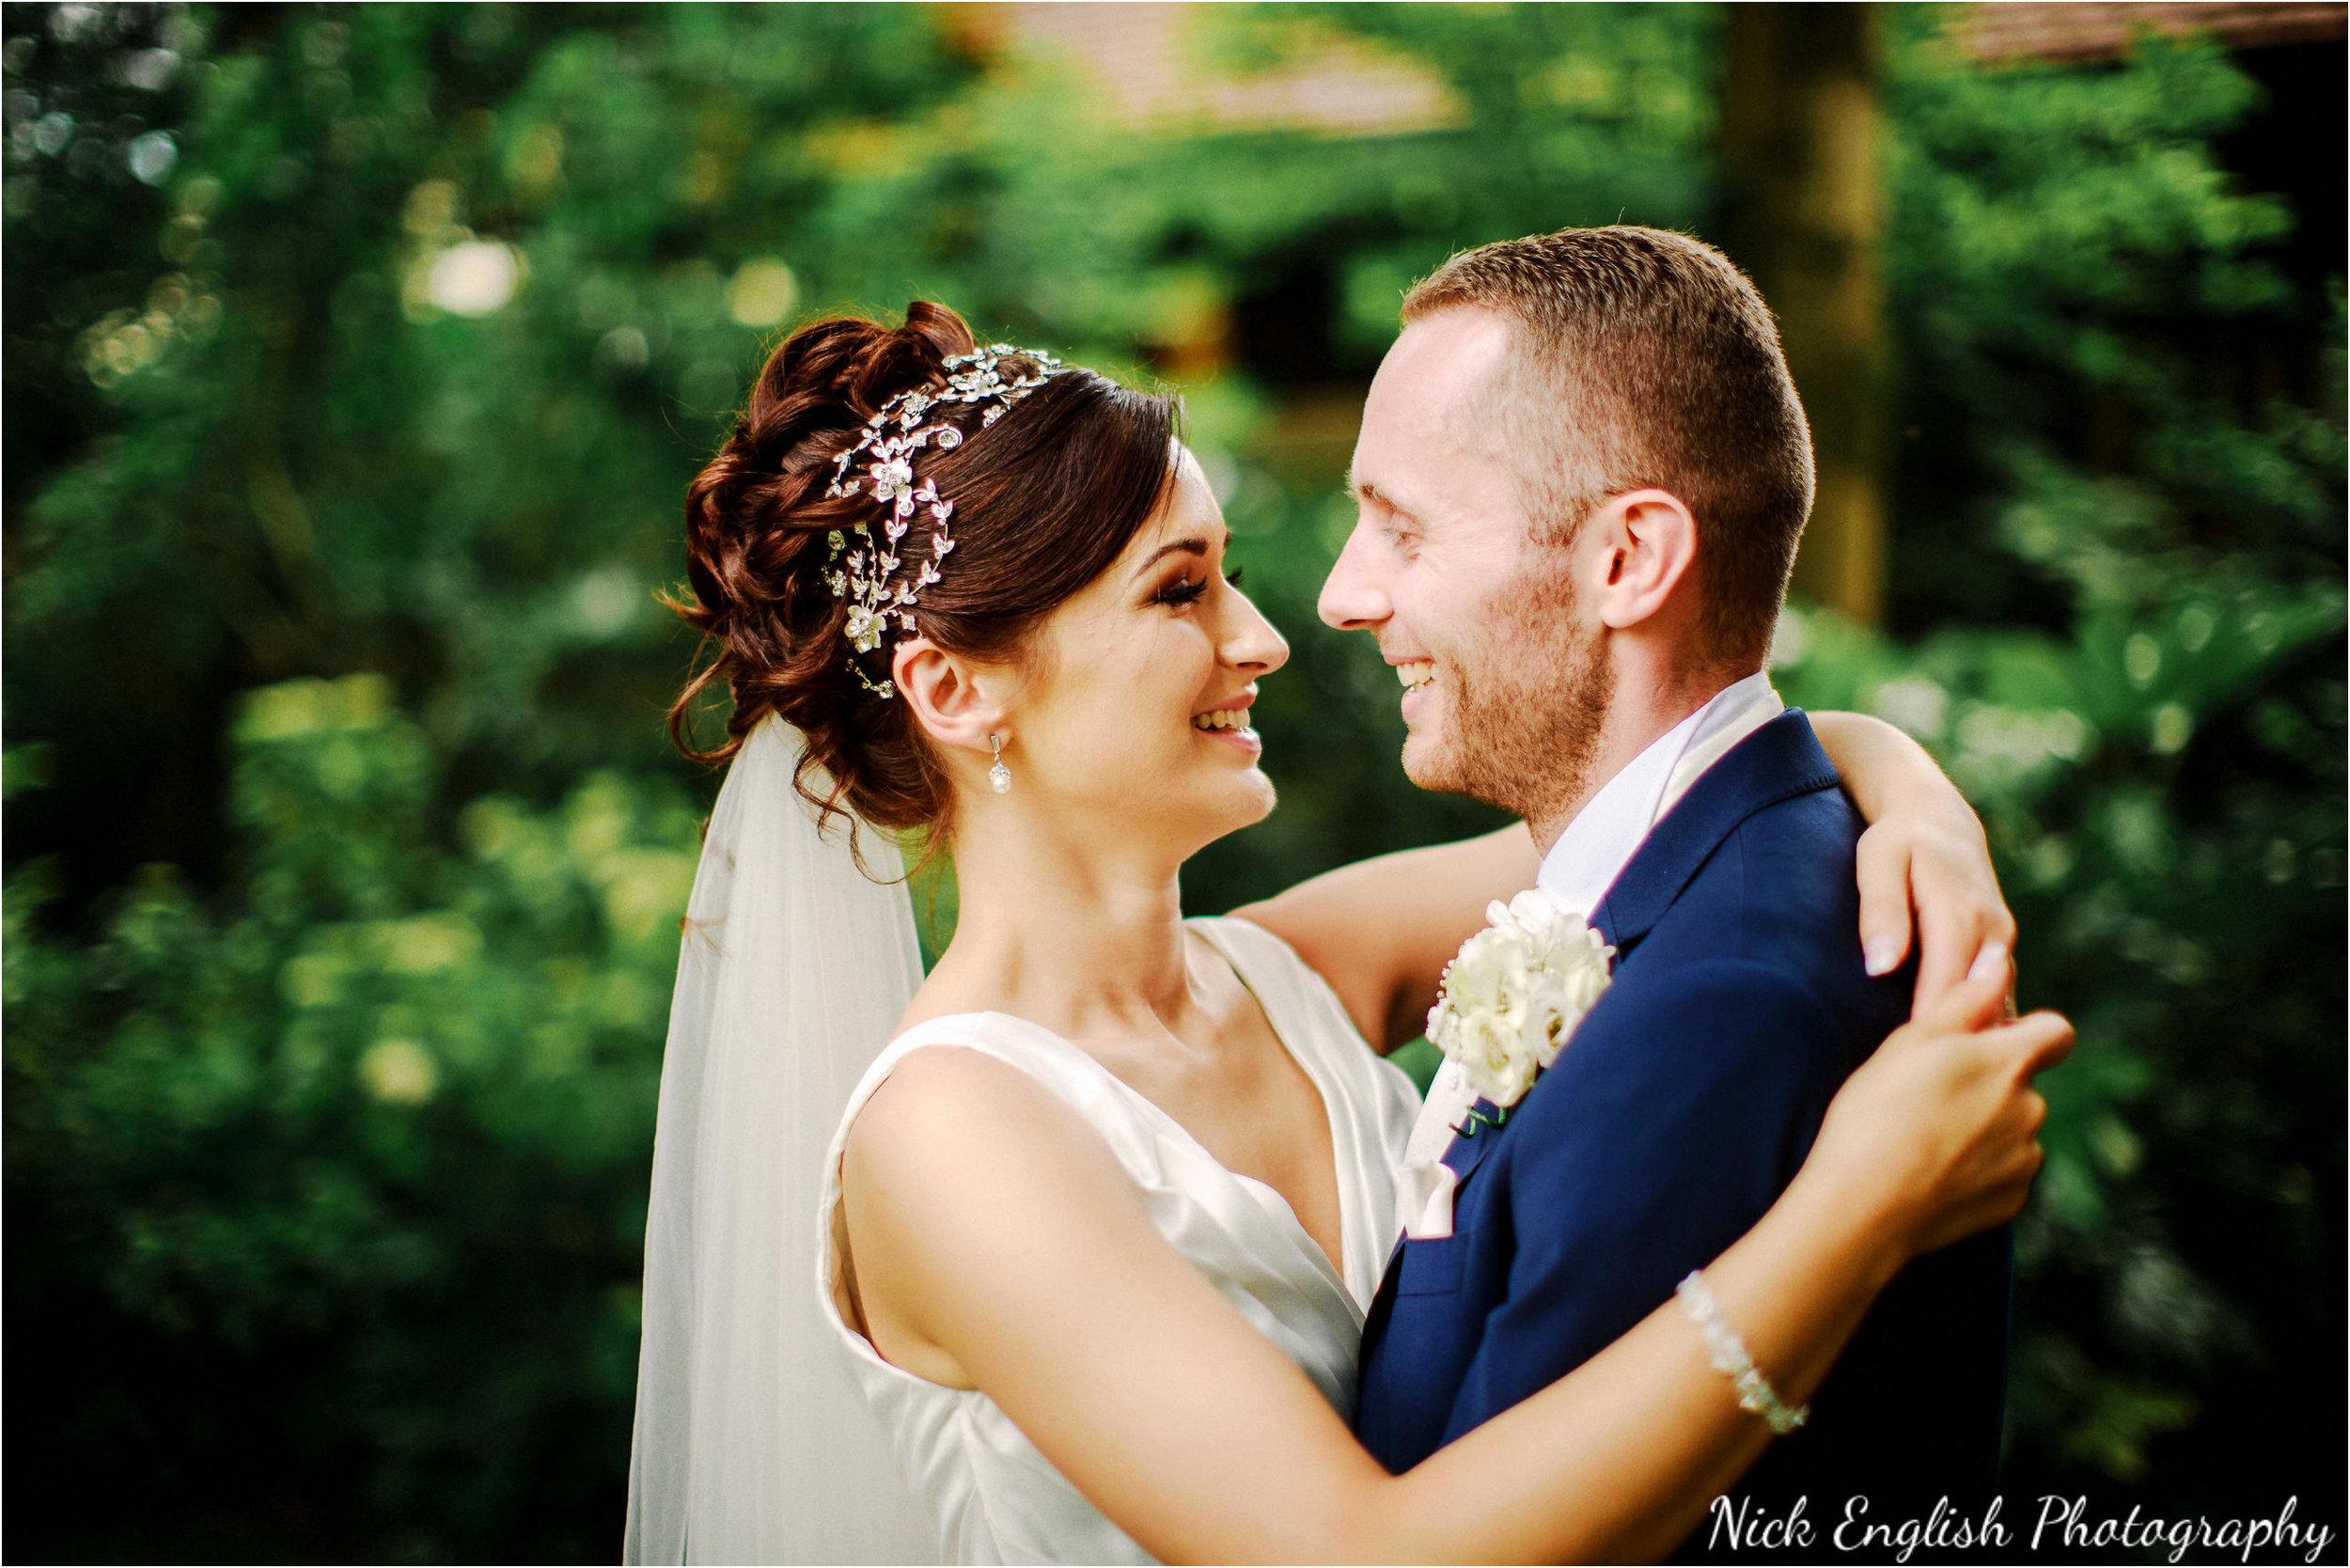 Emily David Wedding Photographs at Barton Grange Preston by Nick English Photography 121jpg.jpeg